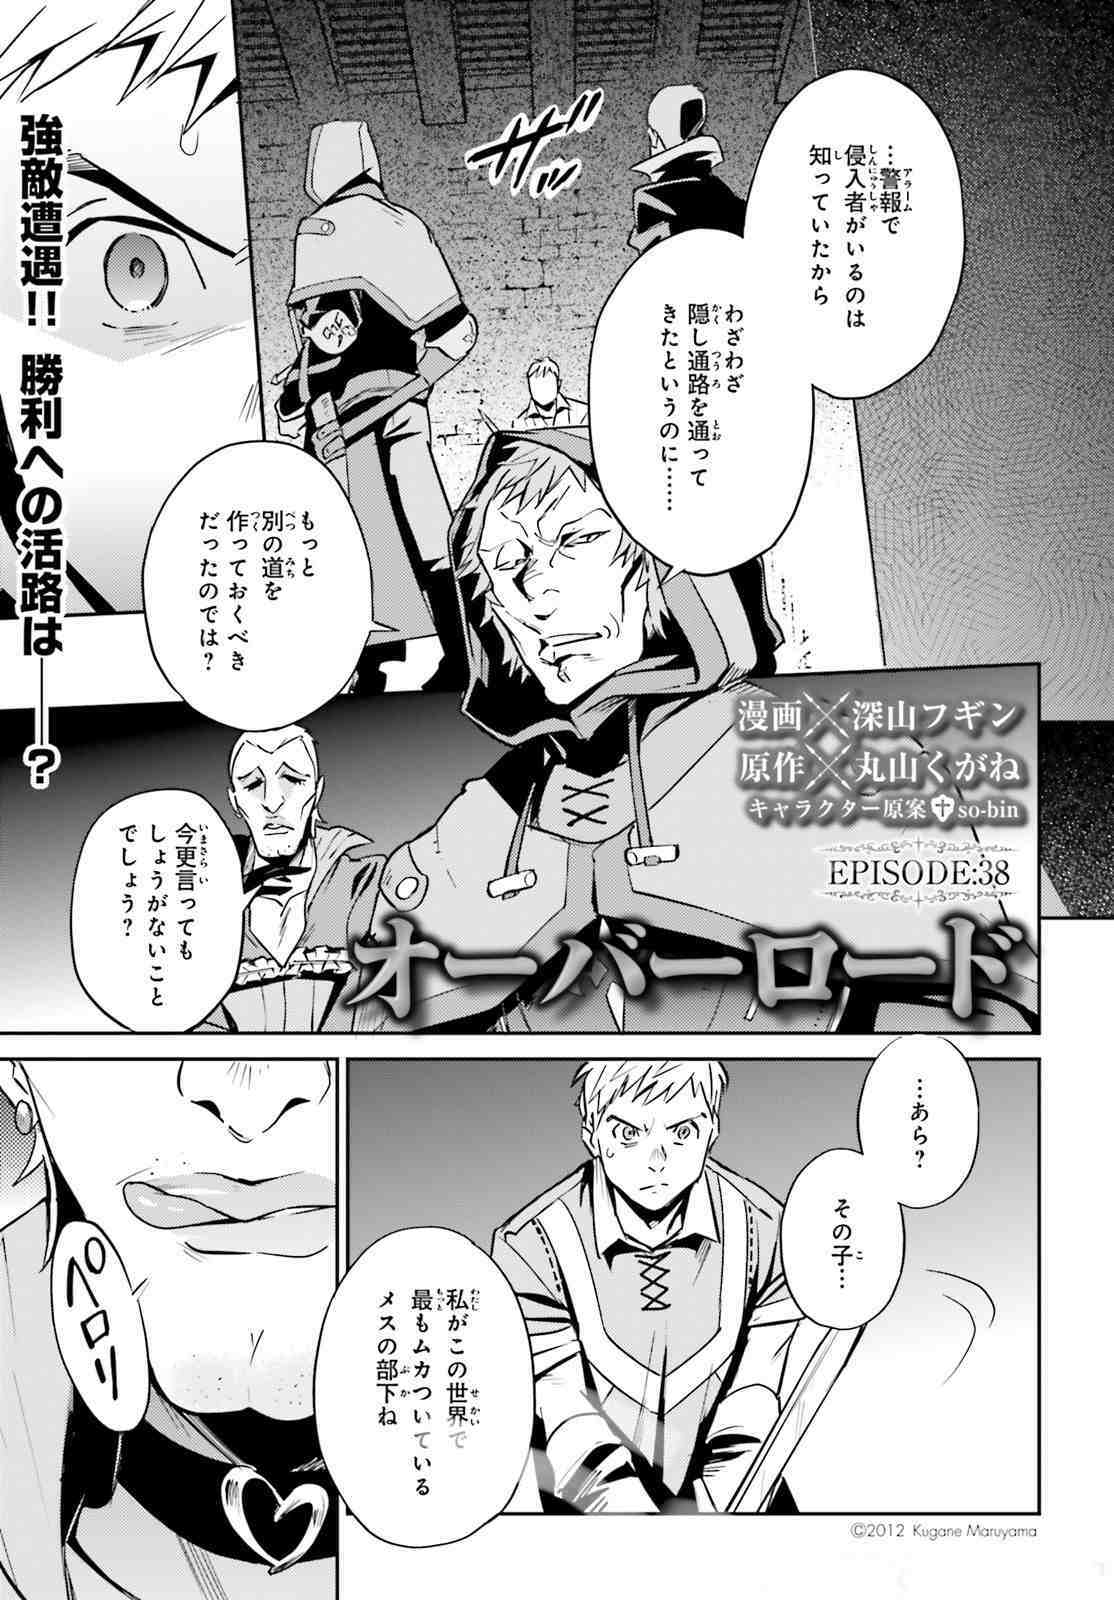 Overlord Manga Chapter 38